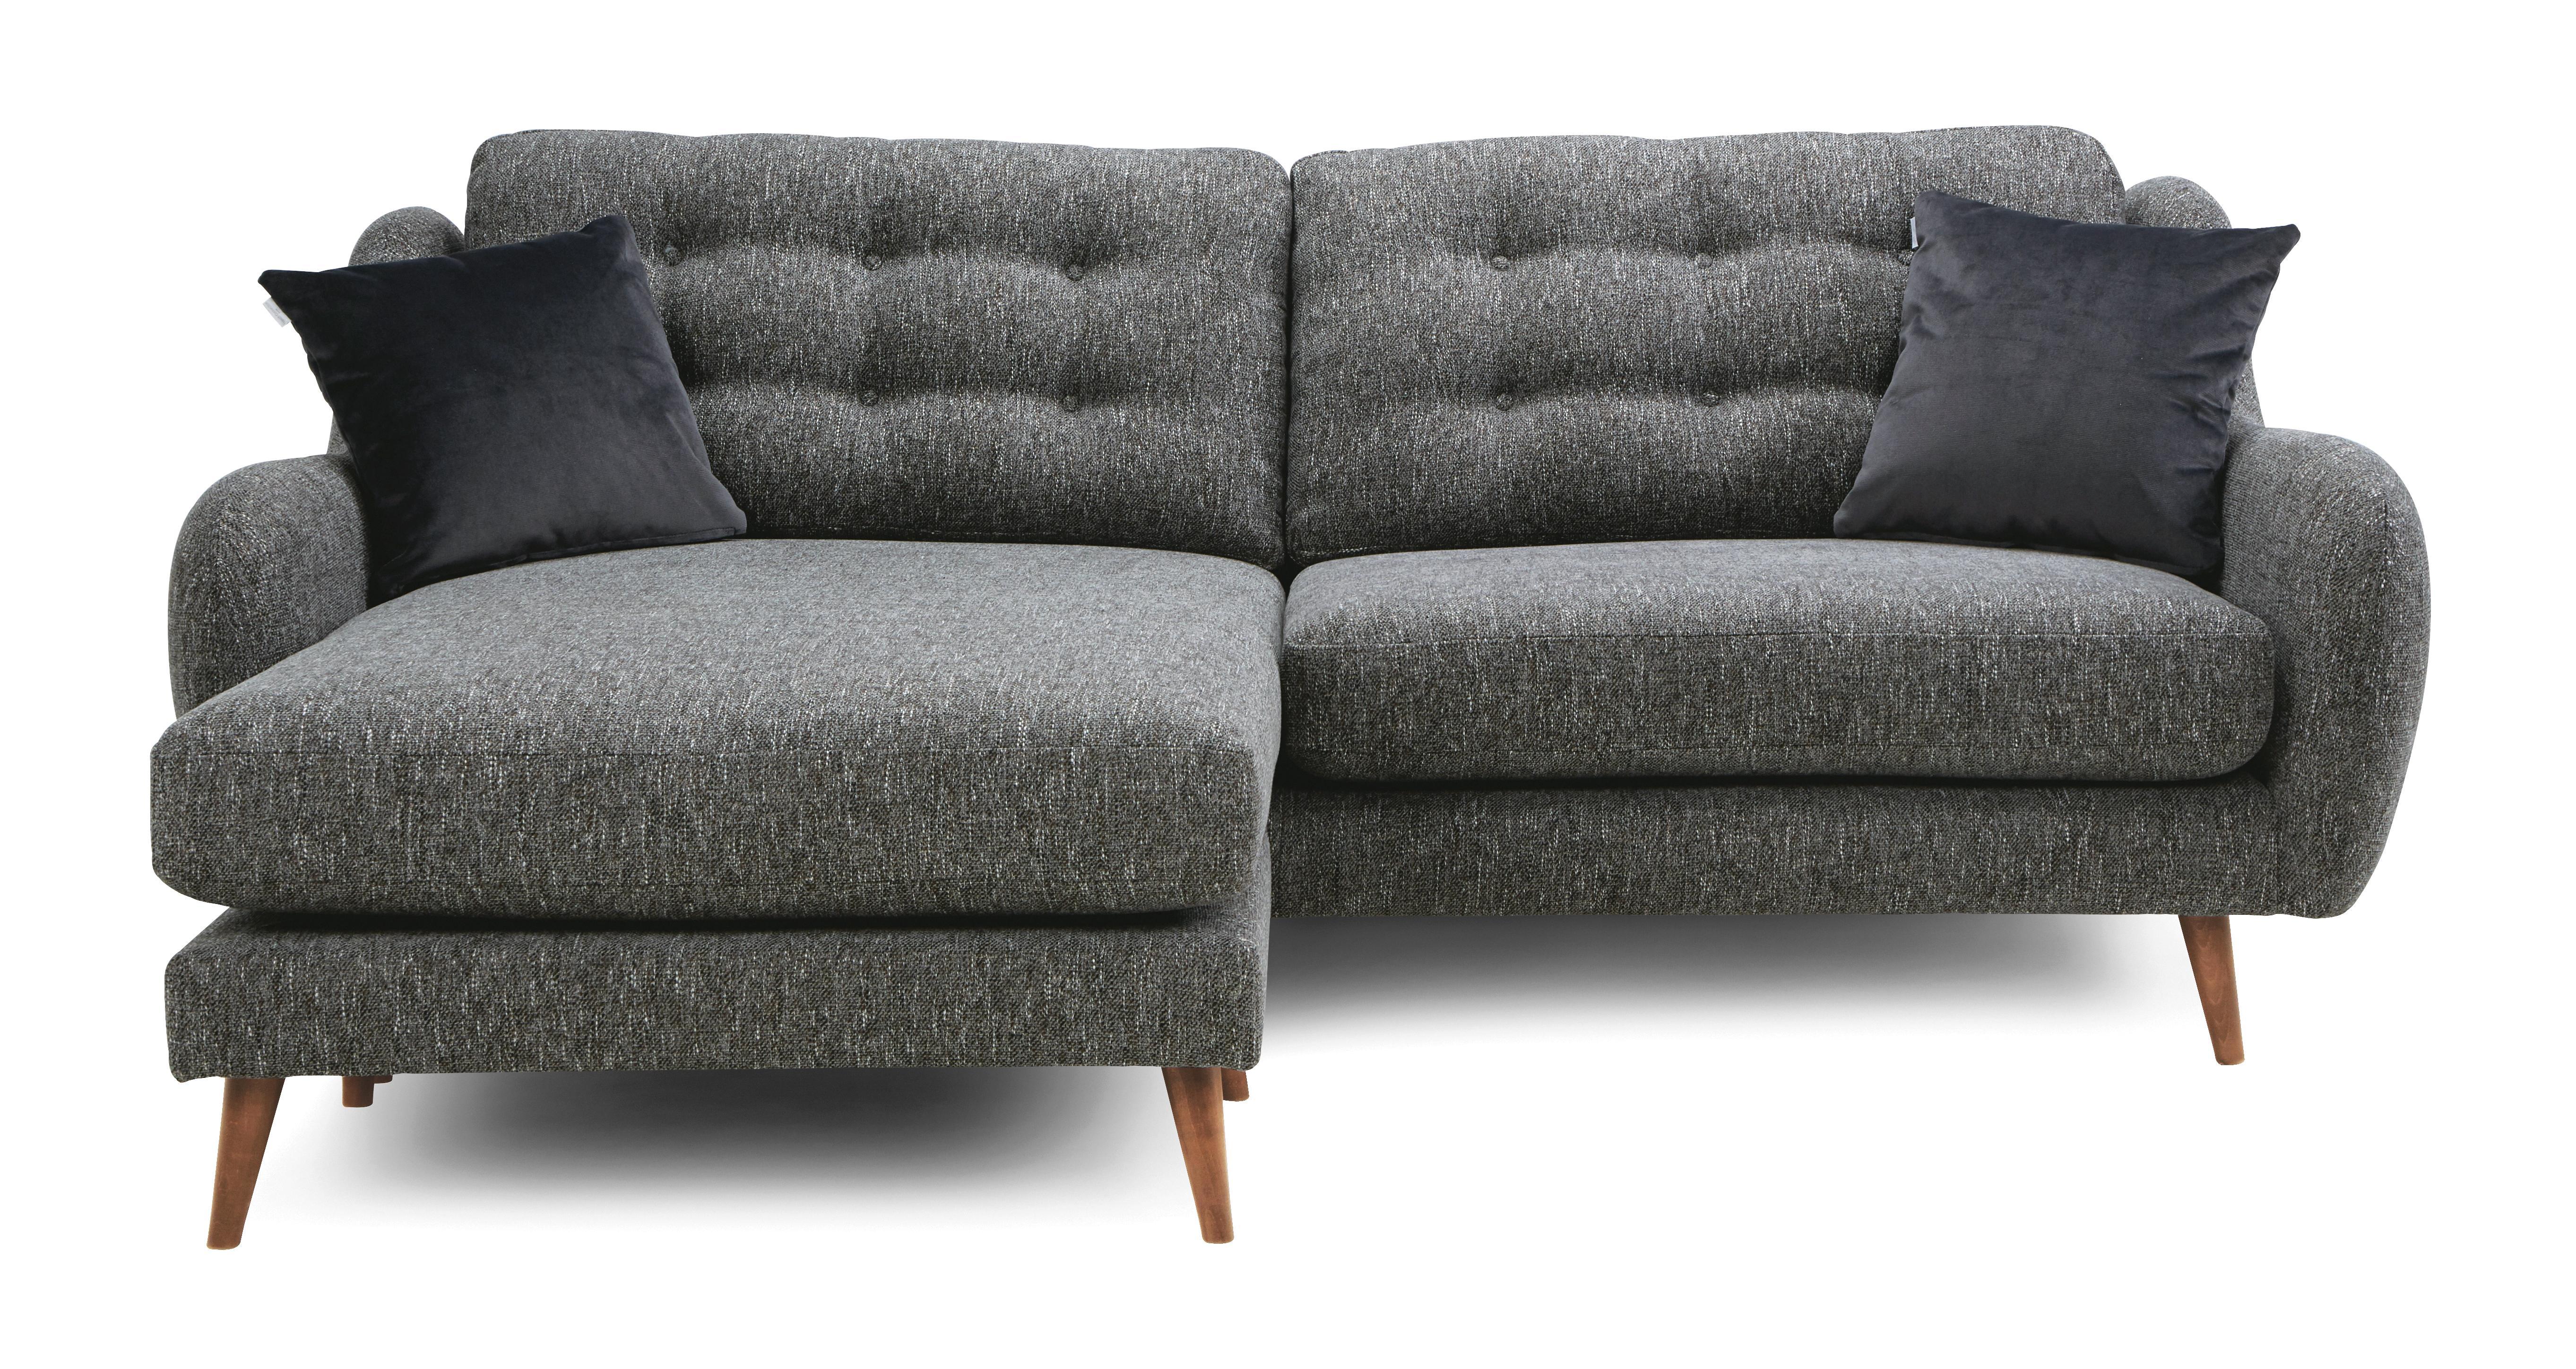 Pleasing Camden Plain 3 Seater Sofa Beutiful Home Inspiration Truamahrainfo